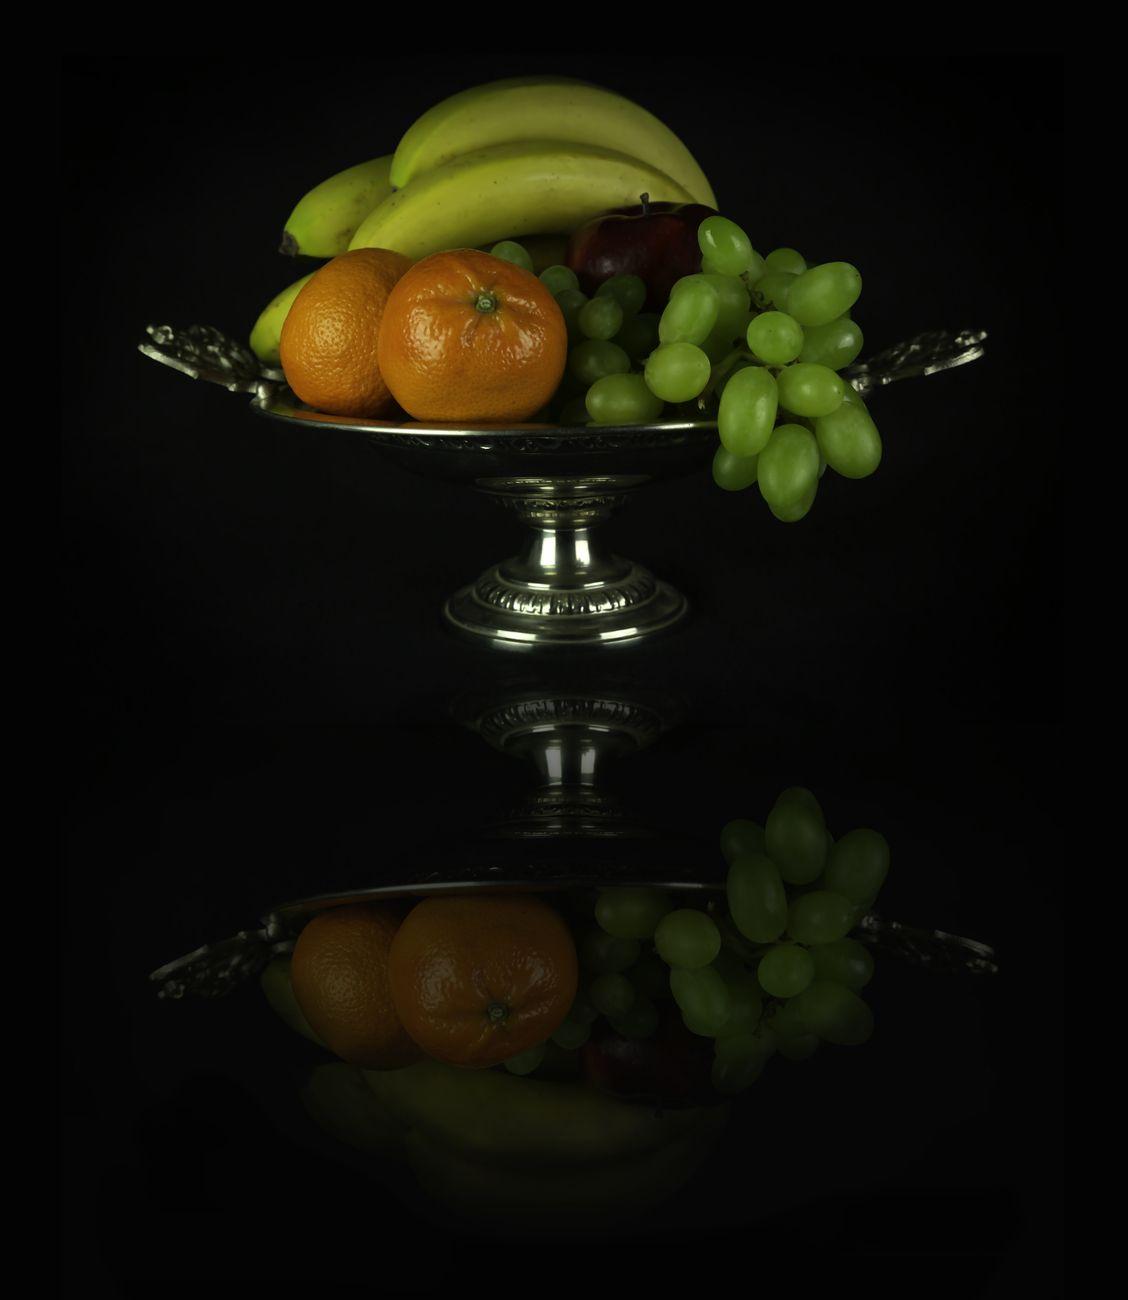 Still life fruit reflecting